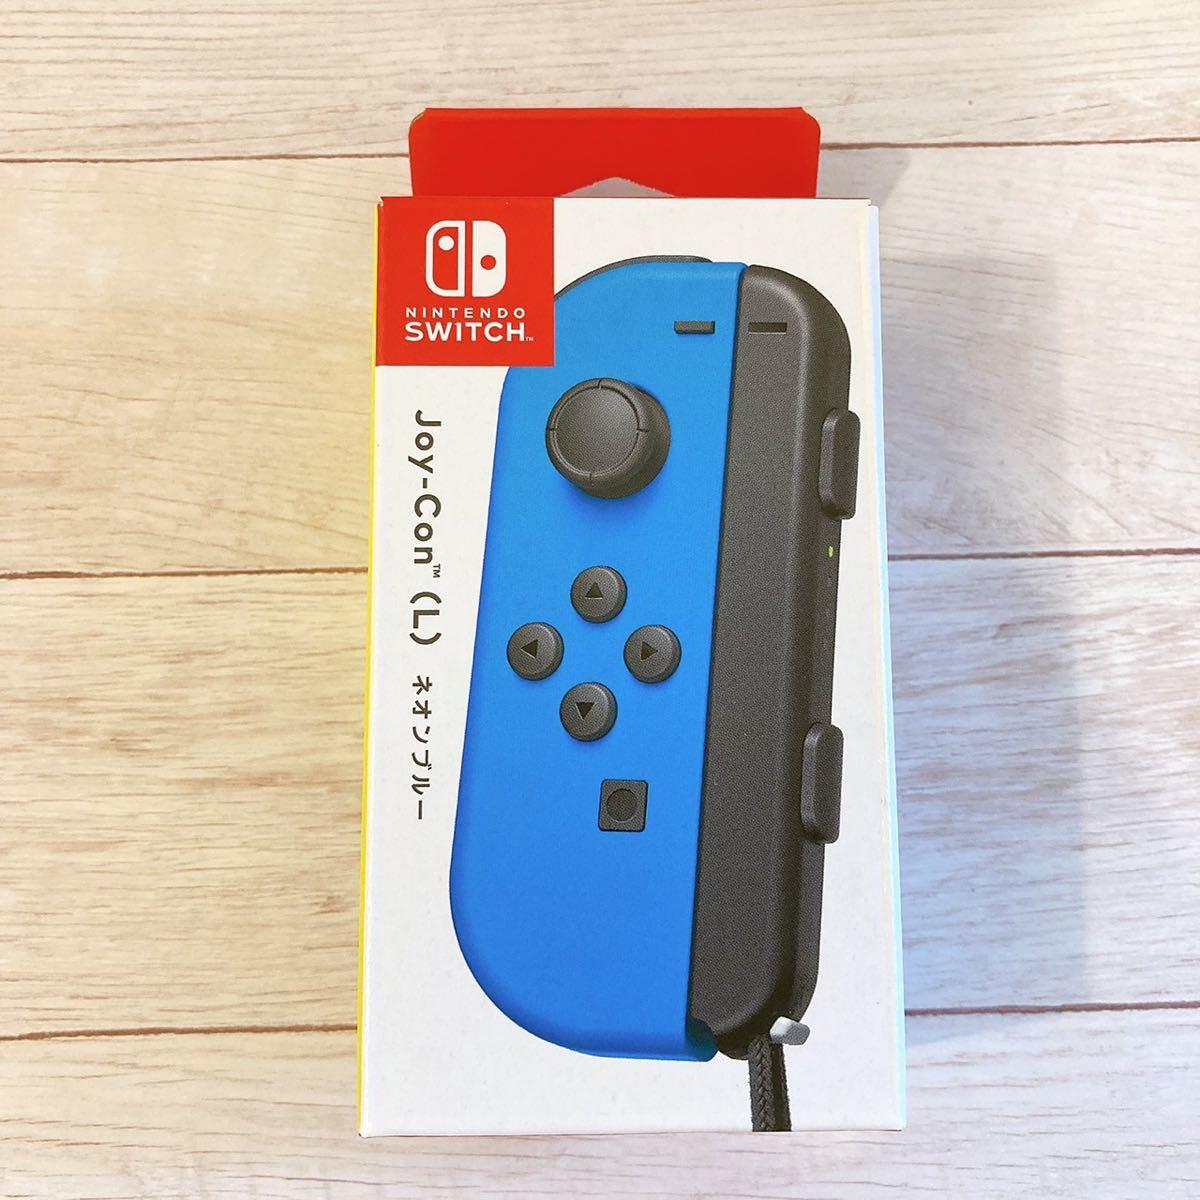 Nintendo Switch ニンテンドースイッチ Joy-Con (L) ジョイコン ネオンブルー